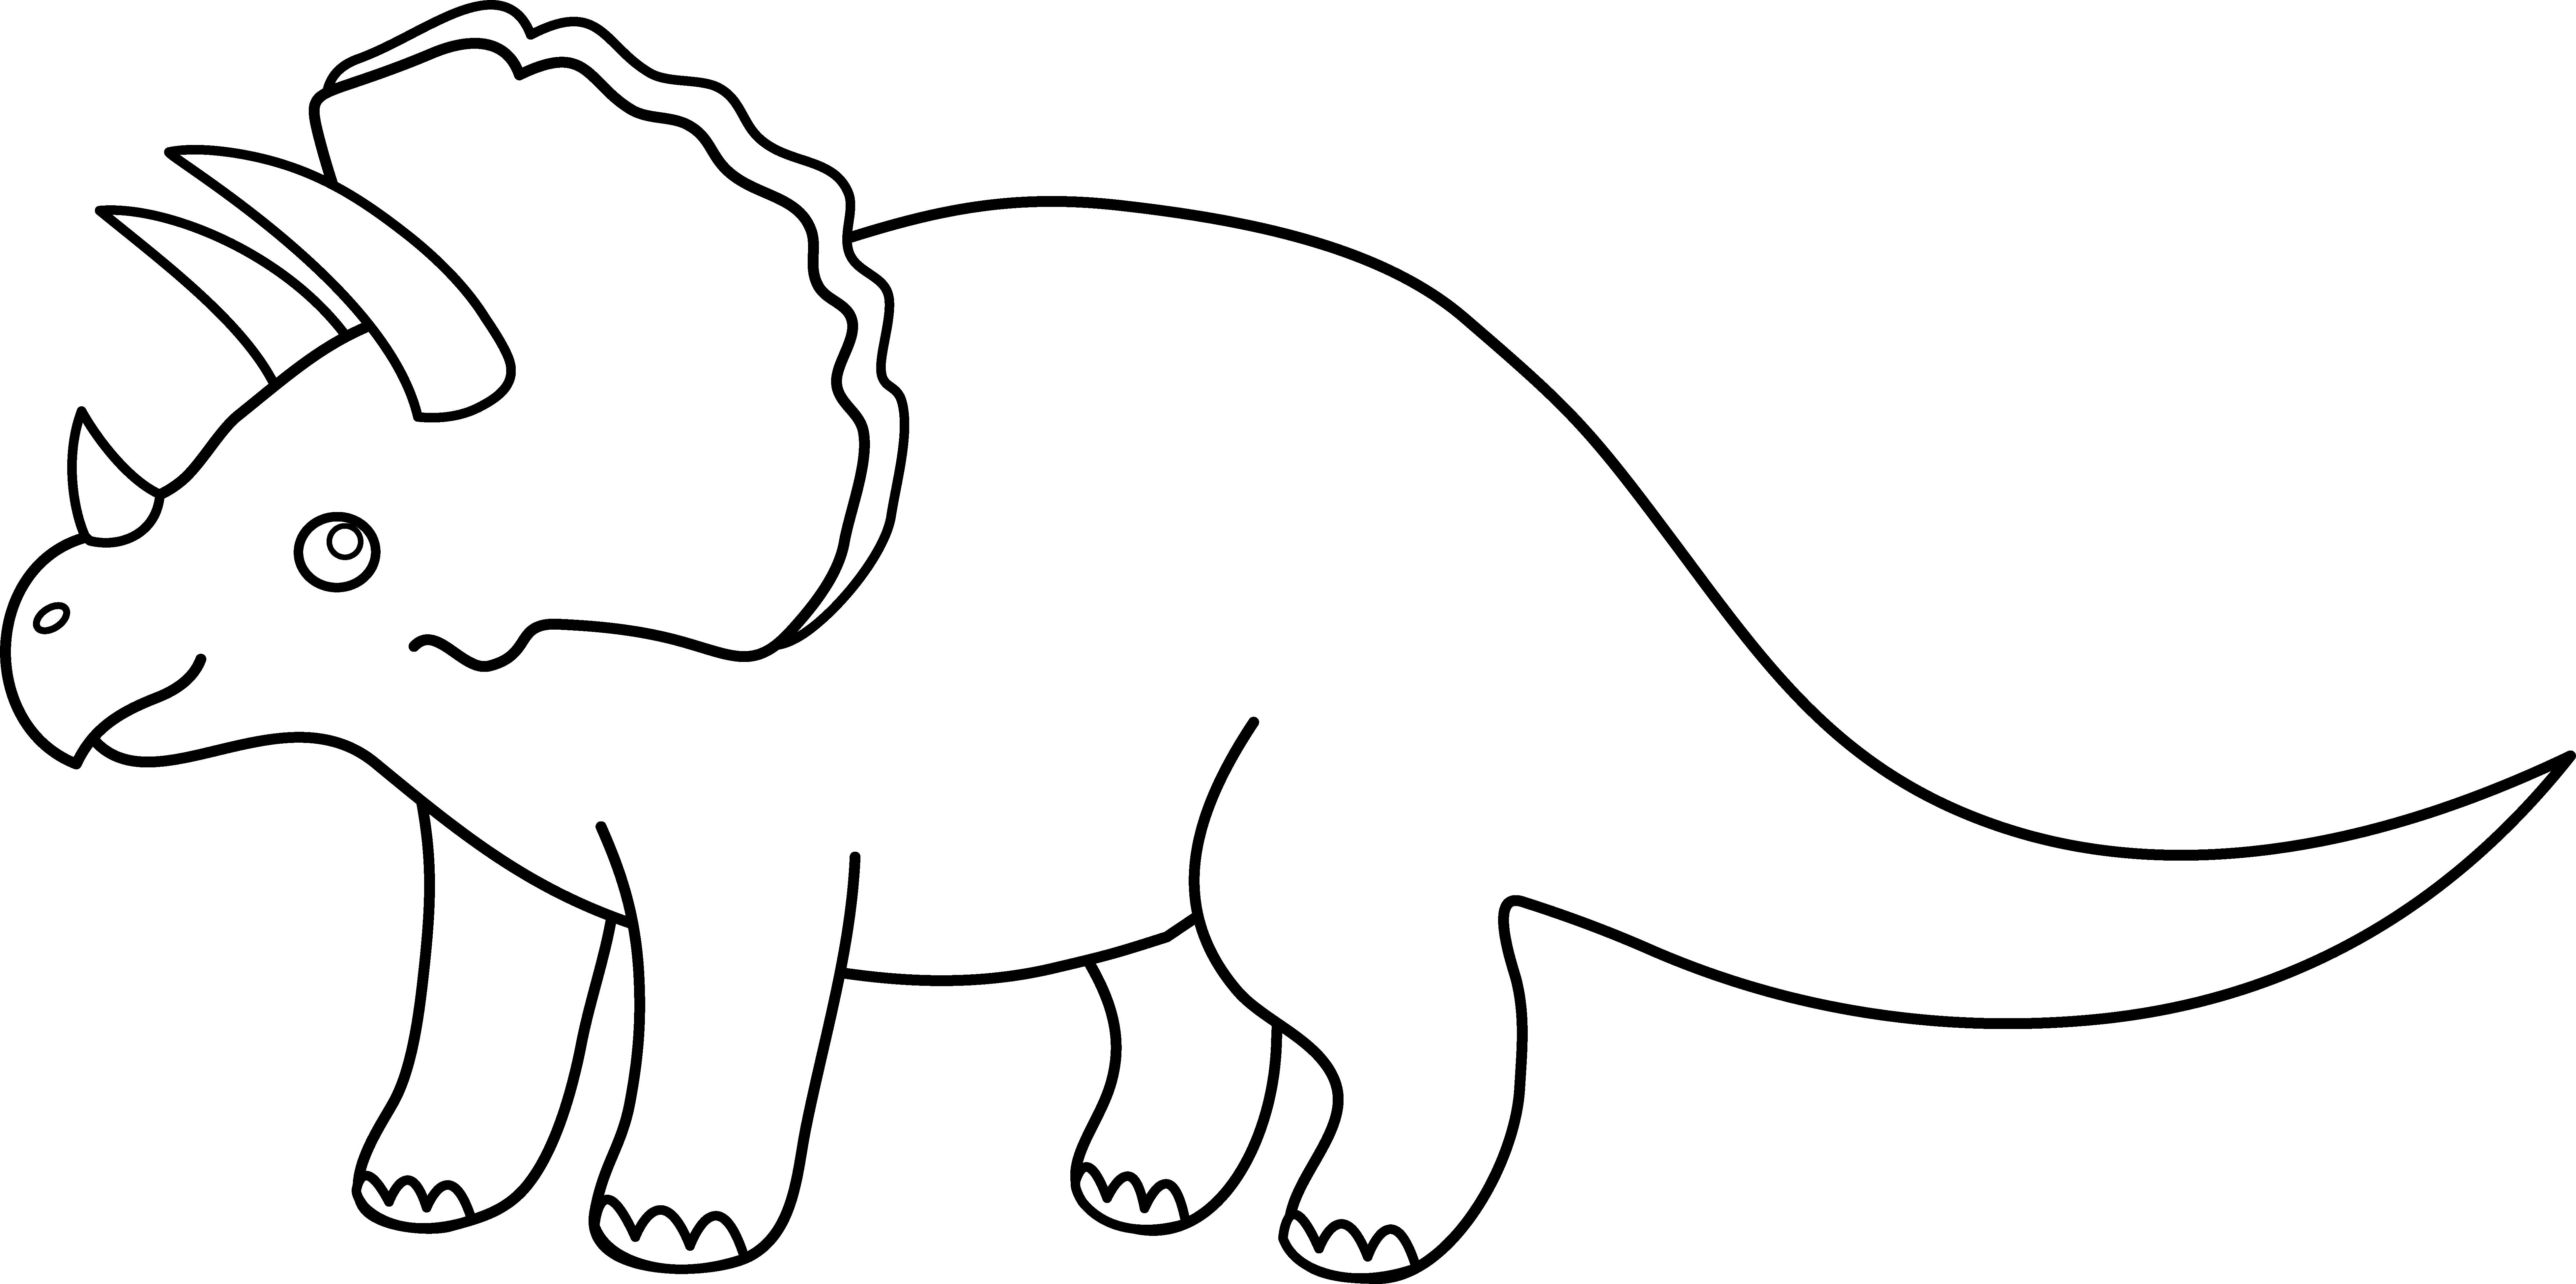 Bones clipart stegosaurus 4 Template org Best Clip